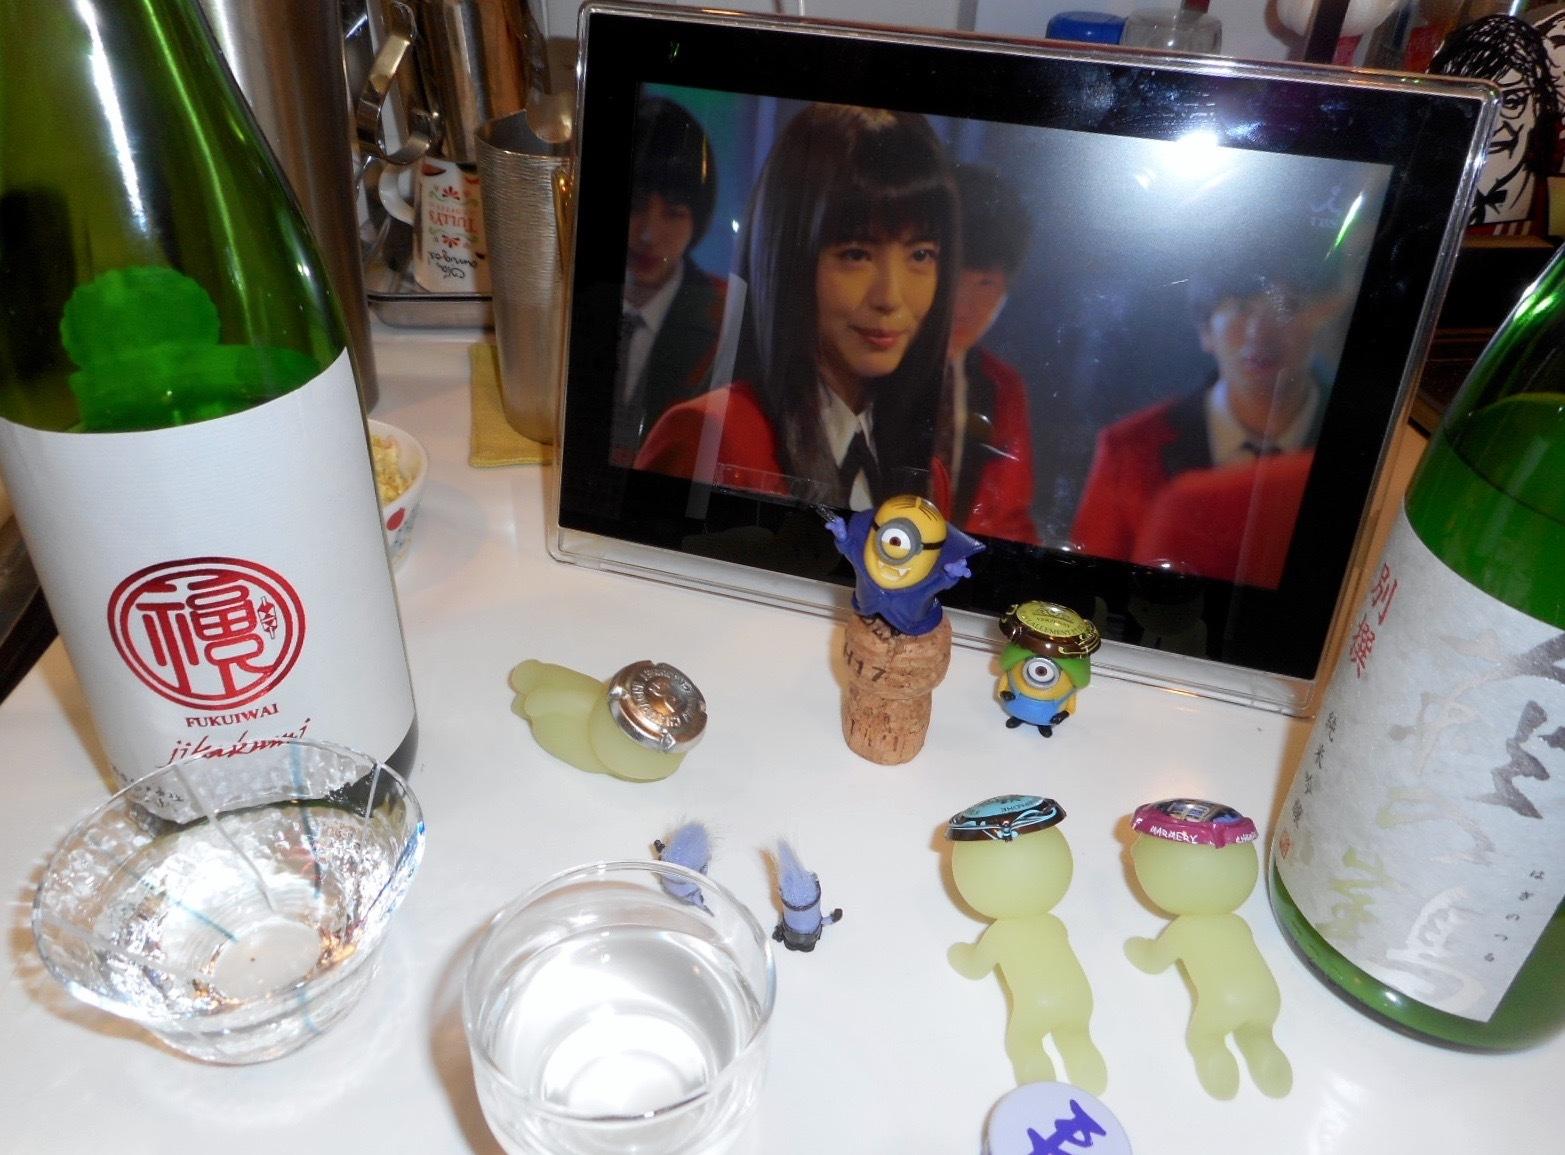 fukuiwai_yamada50jikagumi29by9.jpg